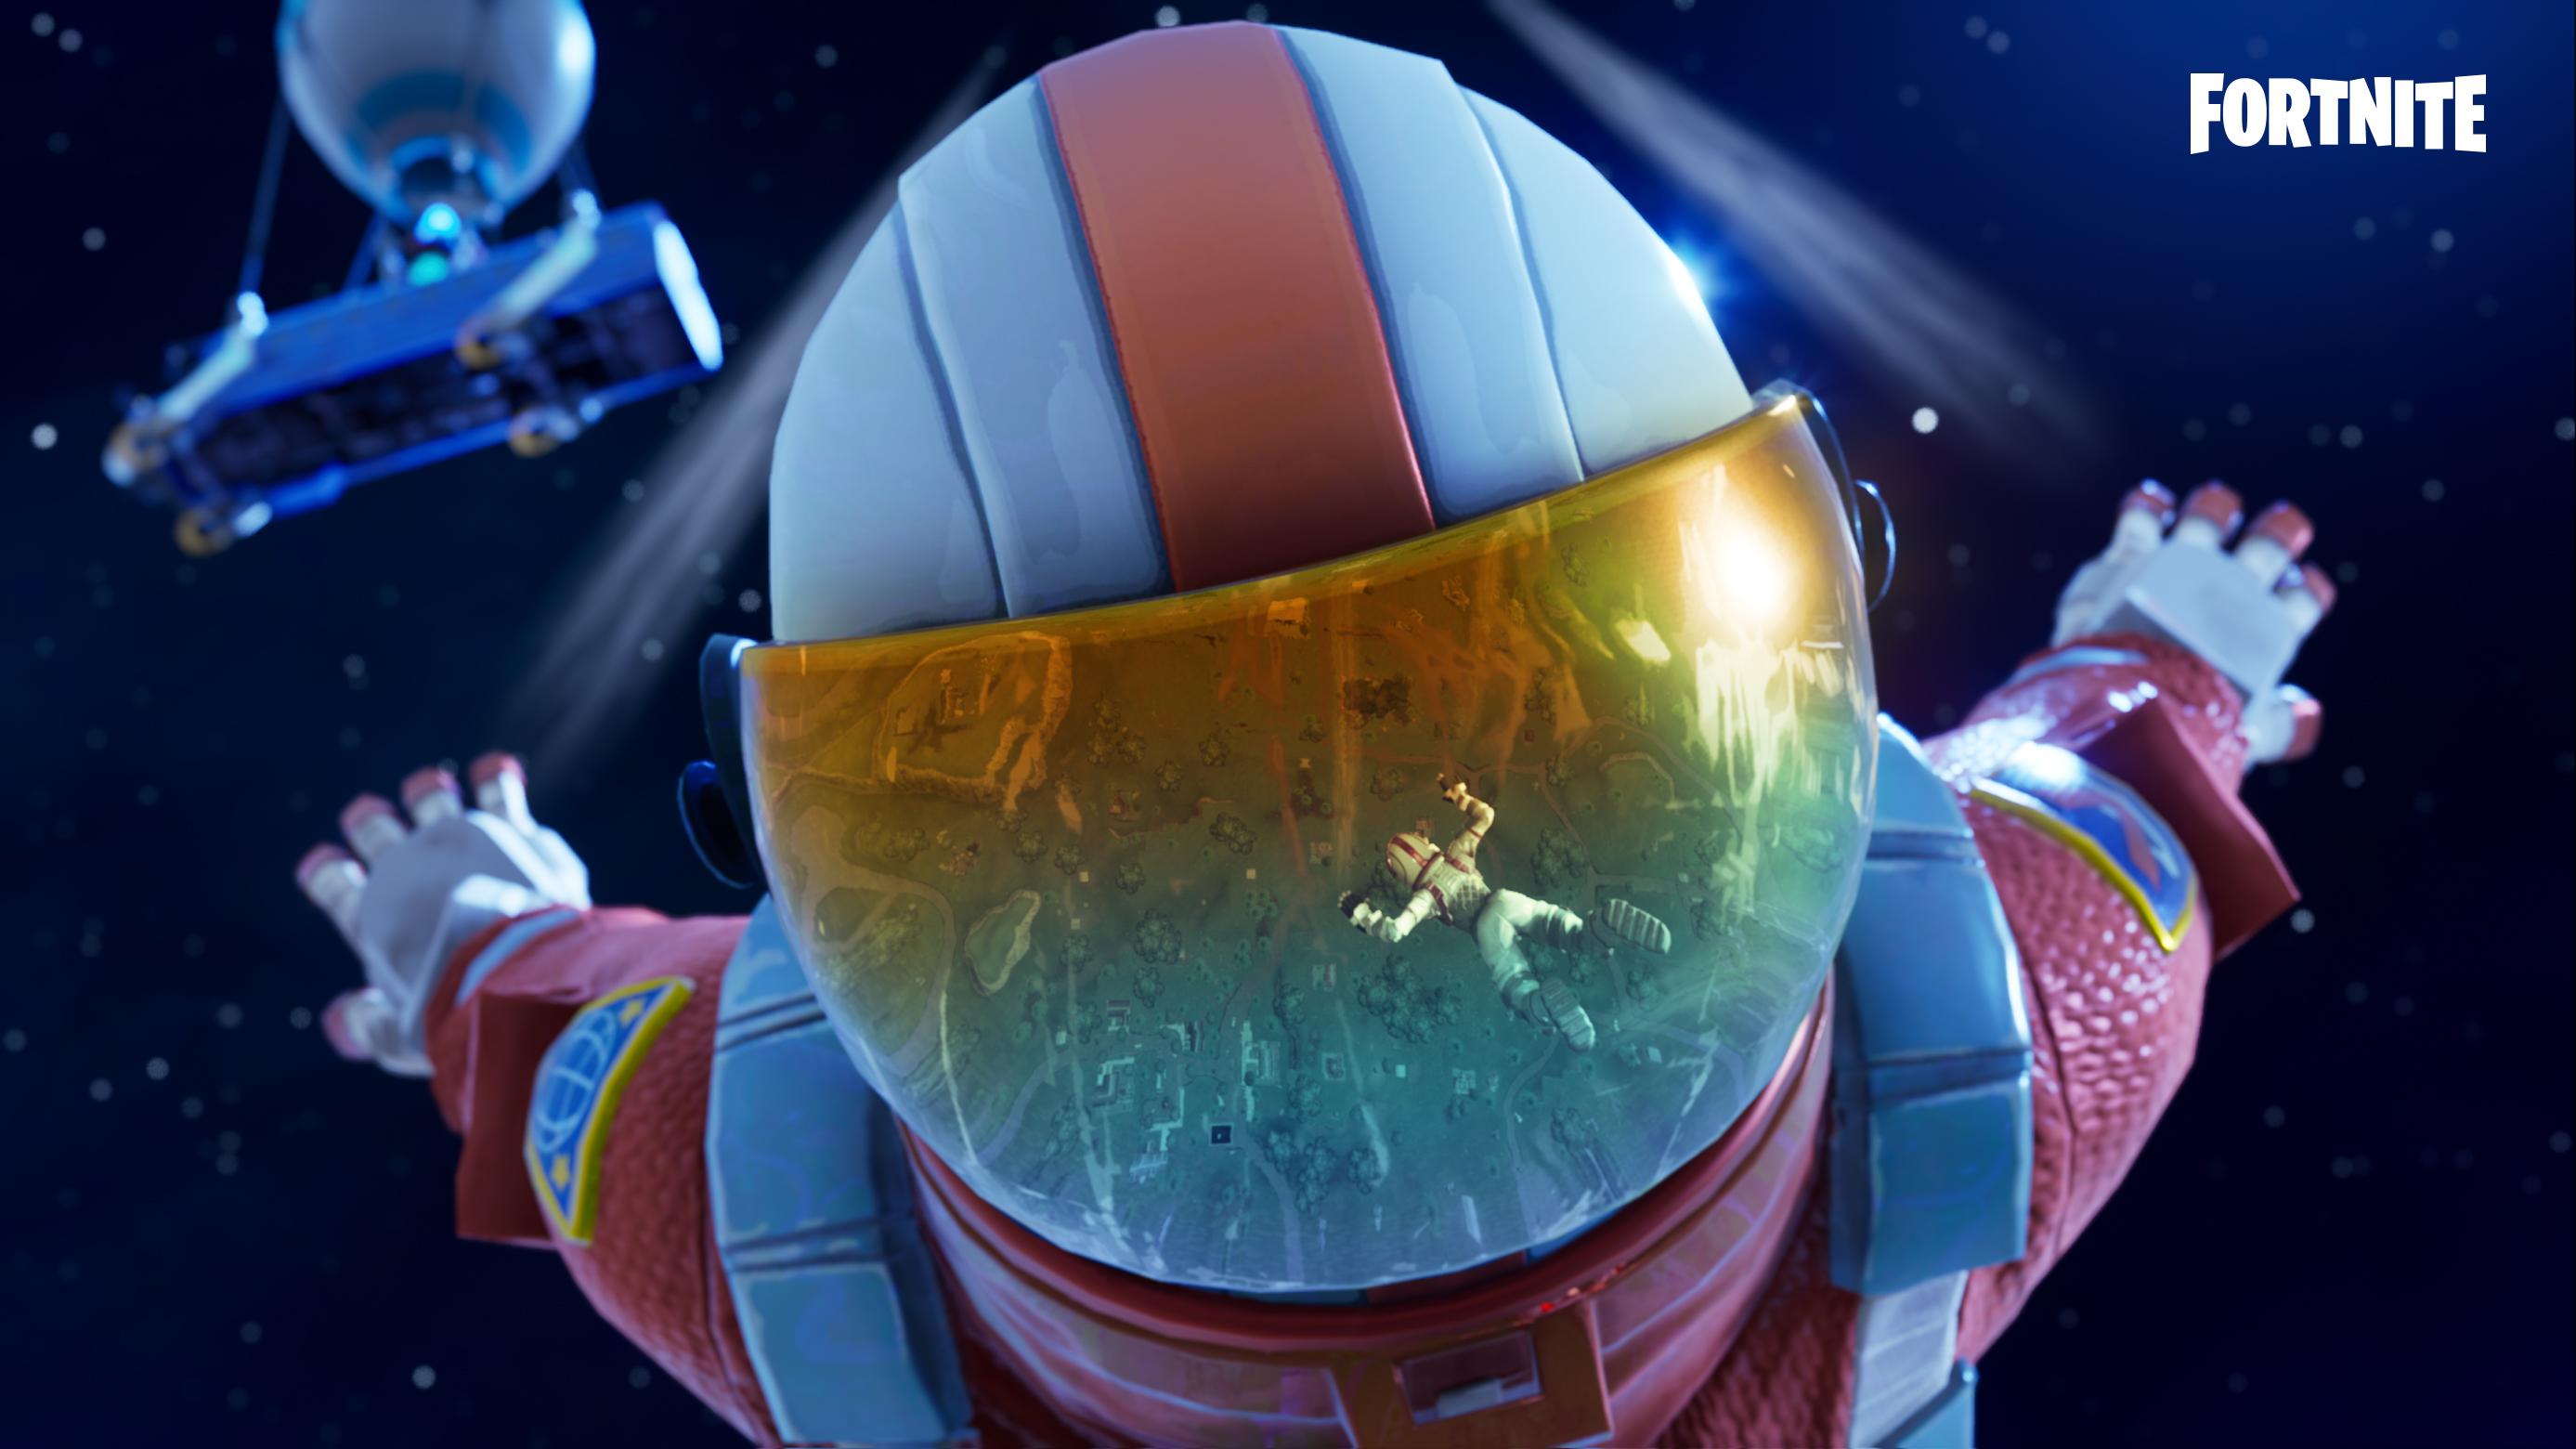 Fortnite detalla su nuevo Pase de Batalla